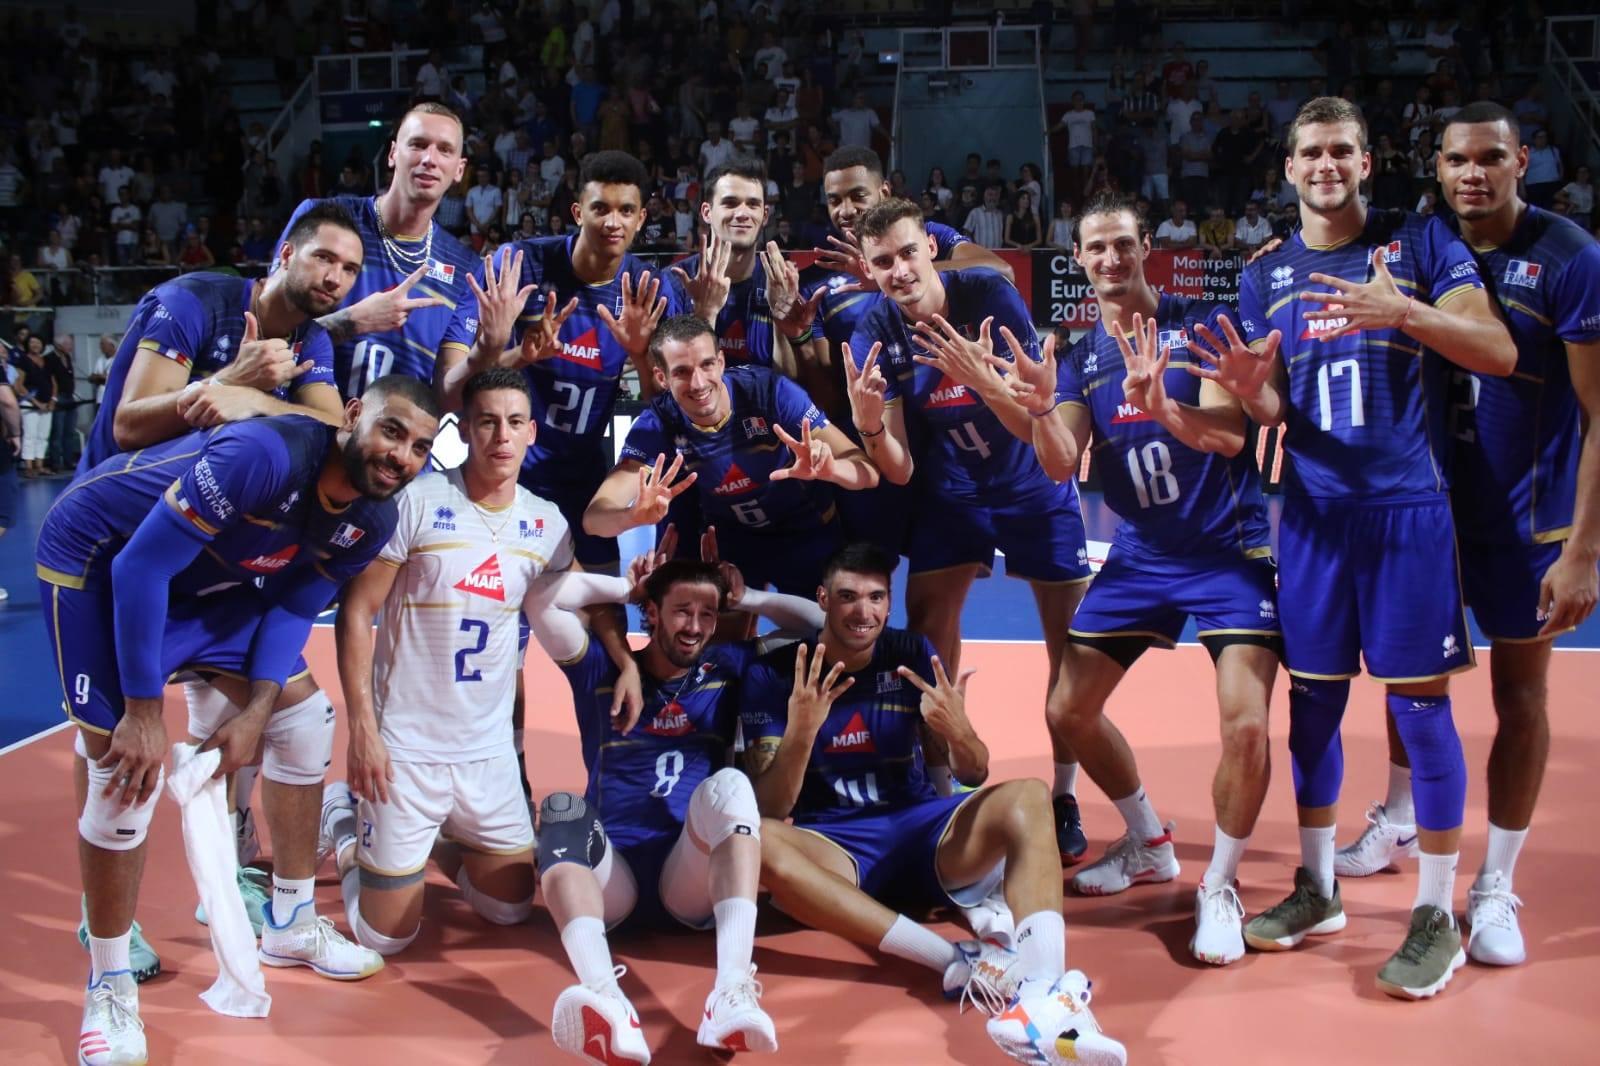 Les deux Equipes de France gagnent